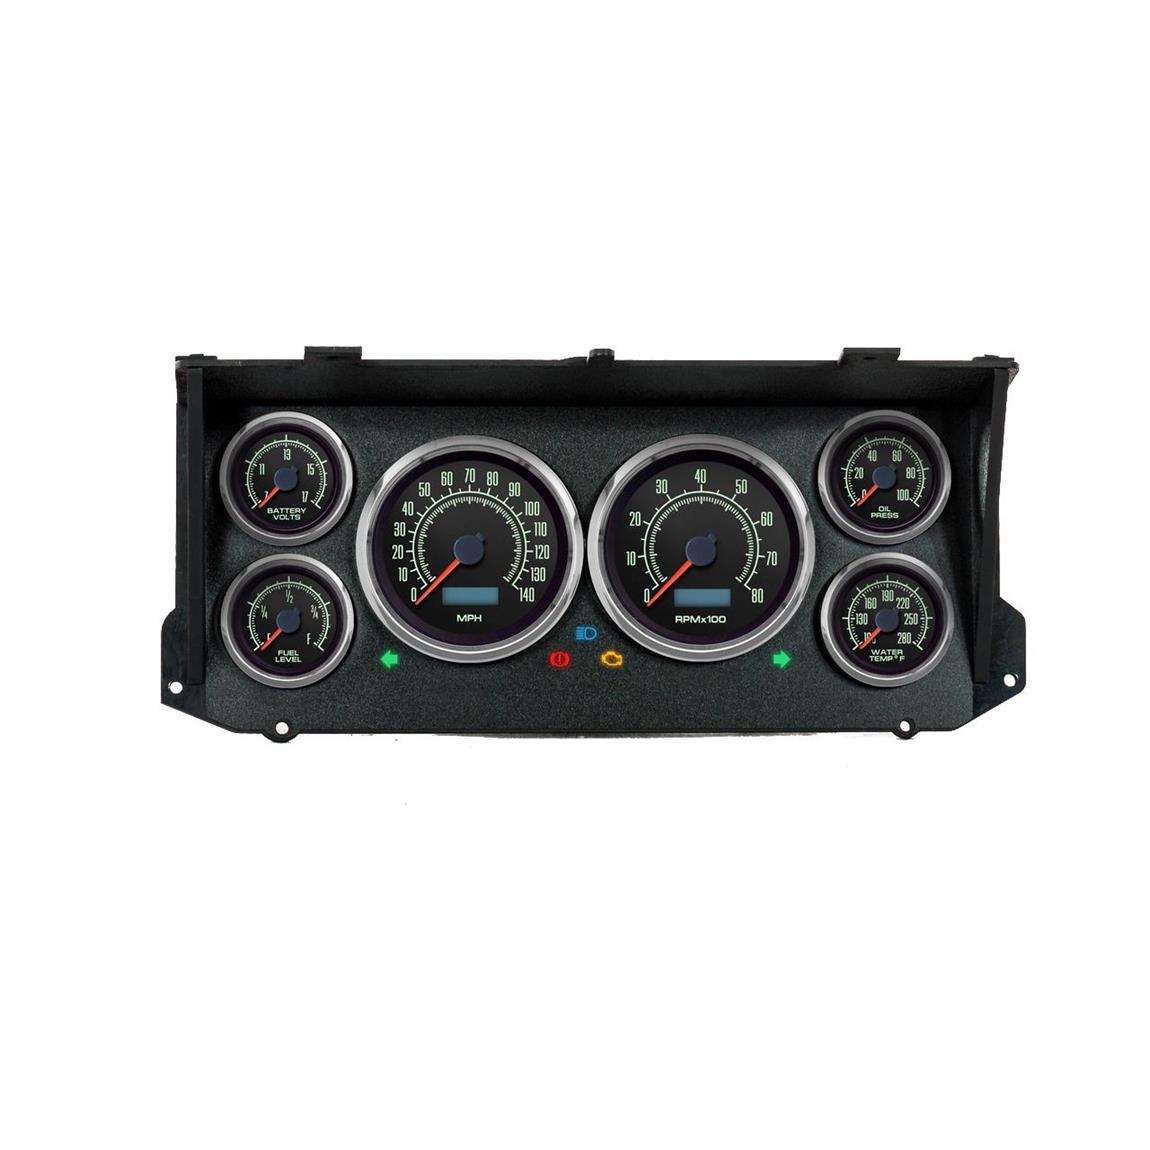 73 Jeep Fuel Gauge Wiring - Wiring Diagram Inside Usal Tachometer Wiring Diagram A on